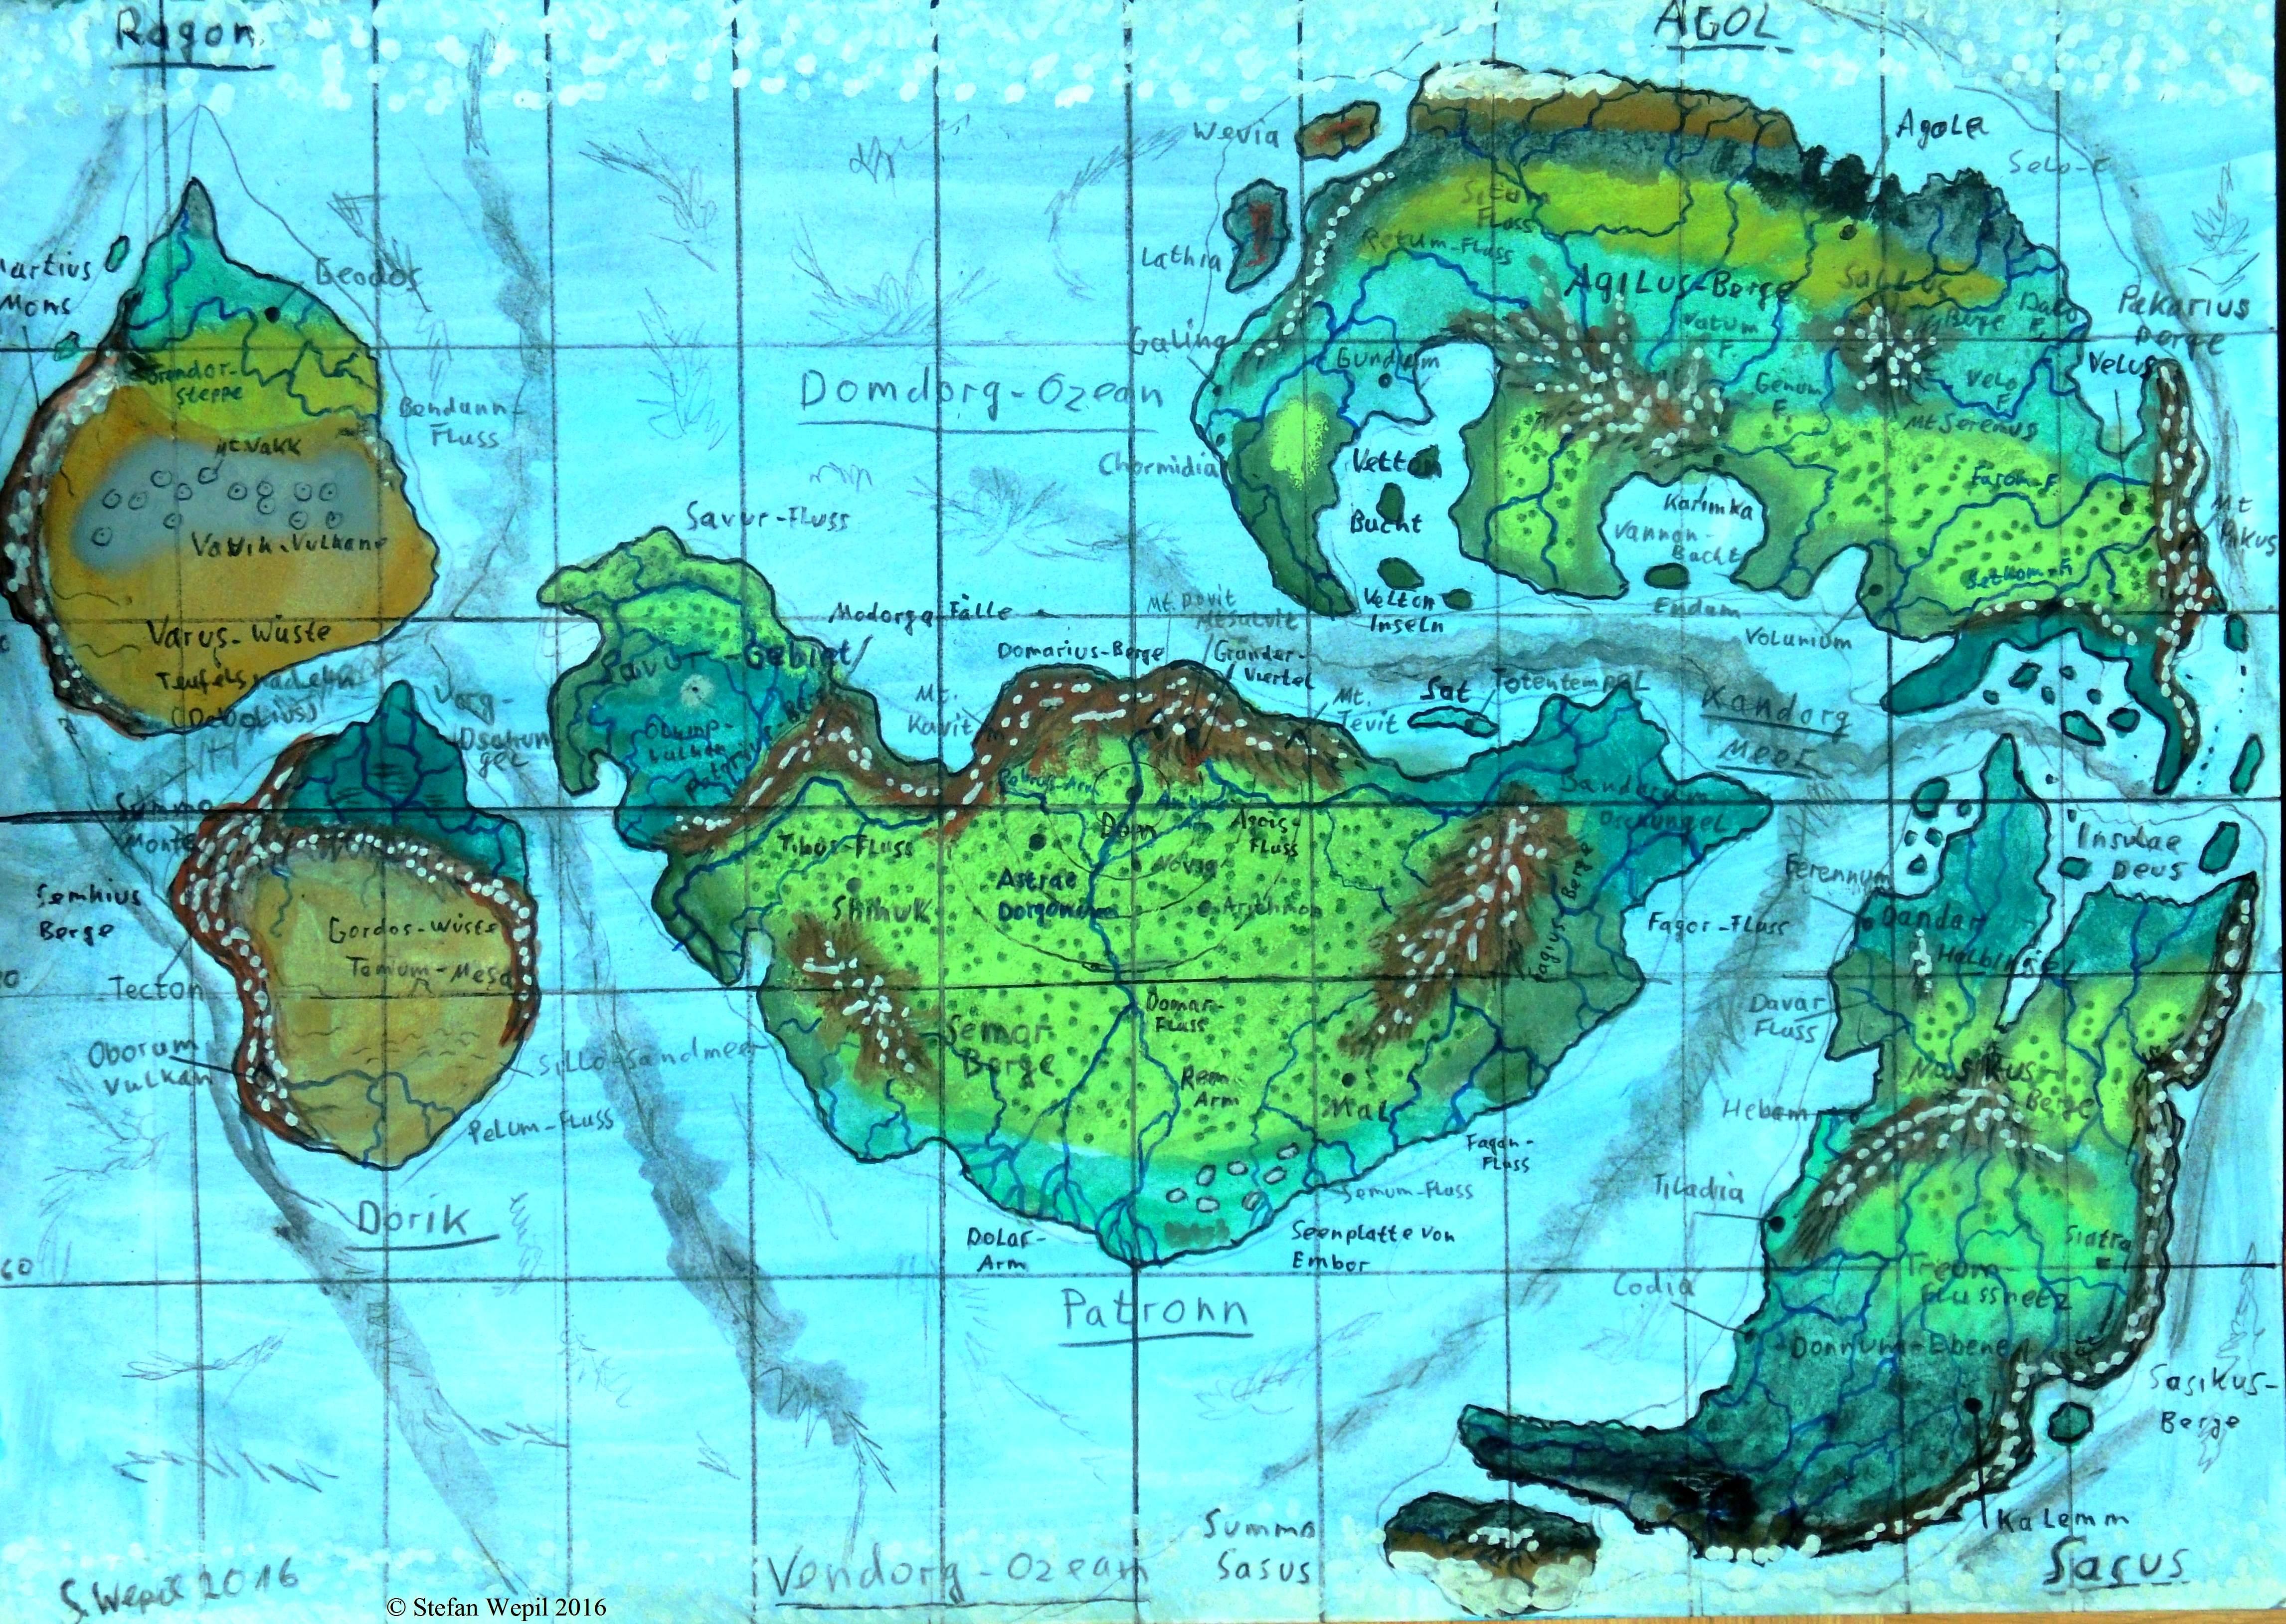 Planetenkarte Dorgon (C) Stefan Wepil